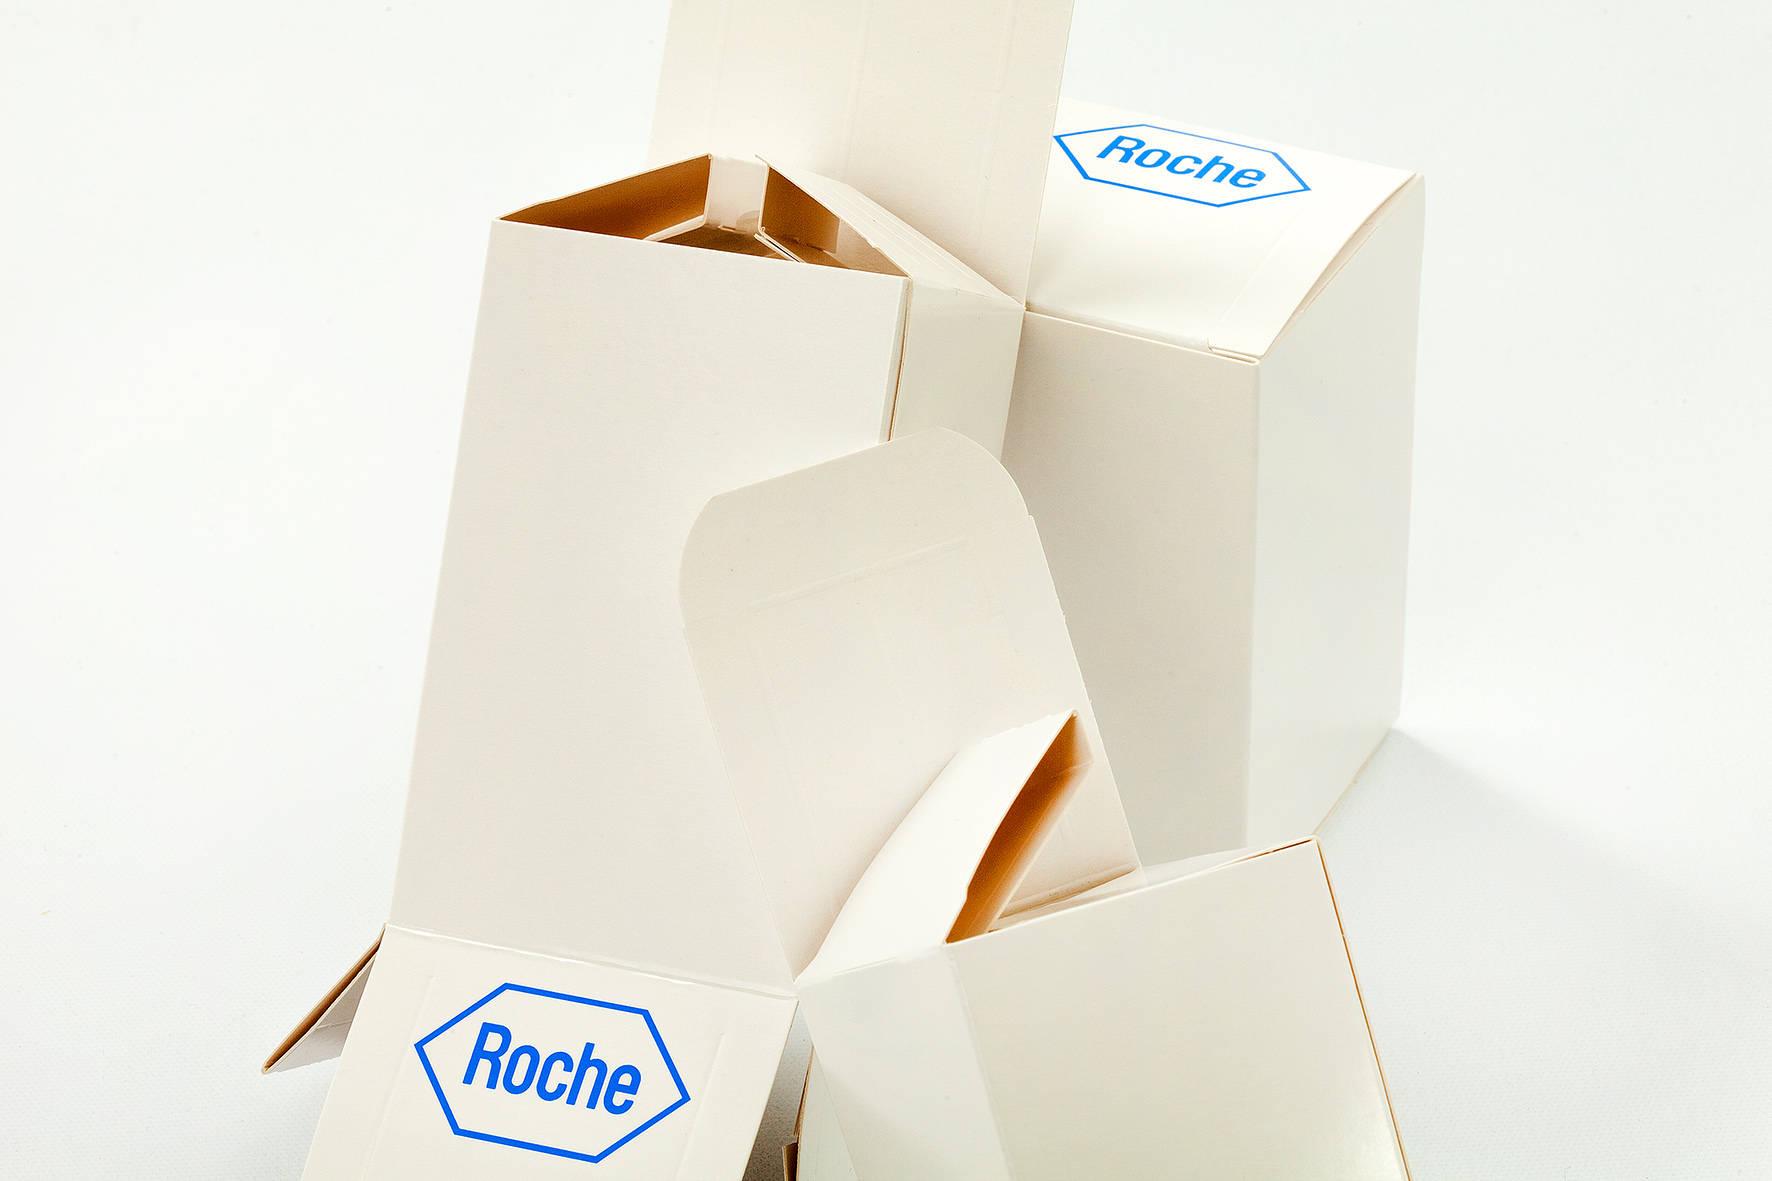 carton-award-image 113563